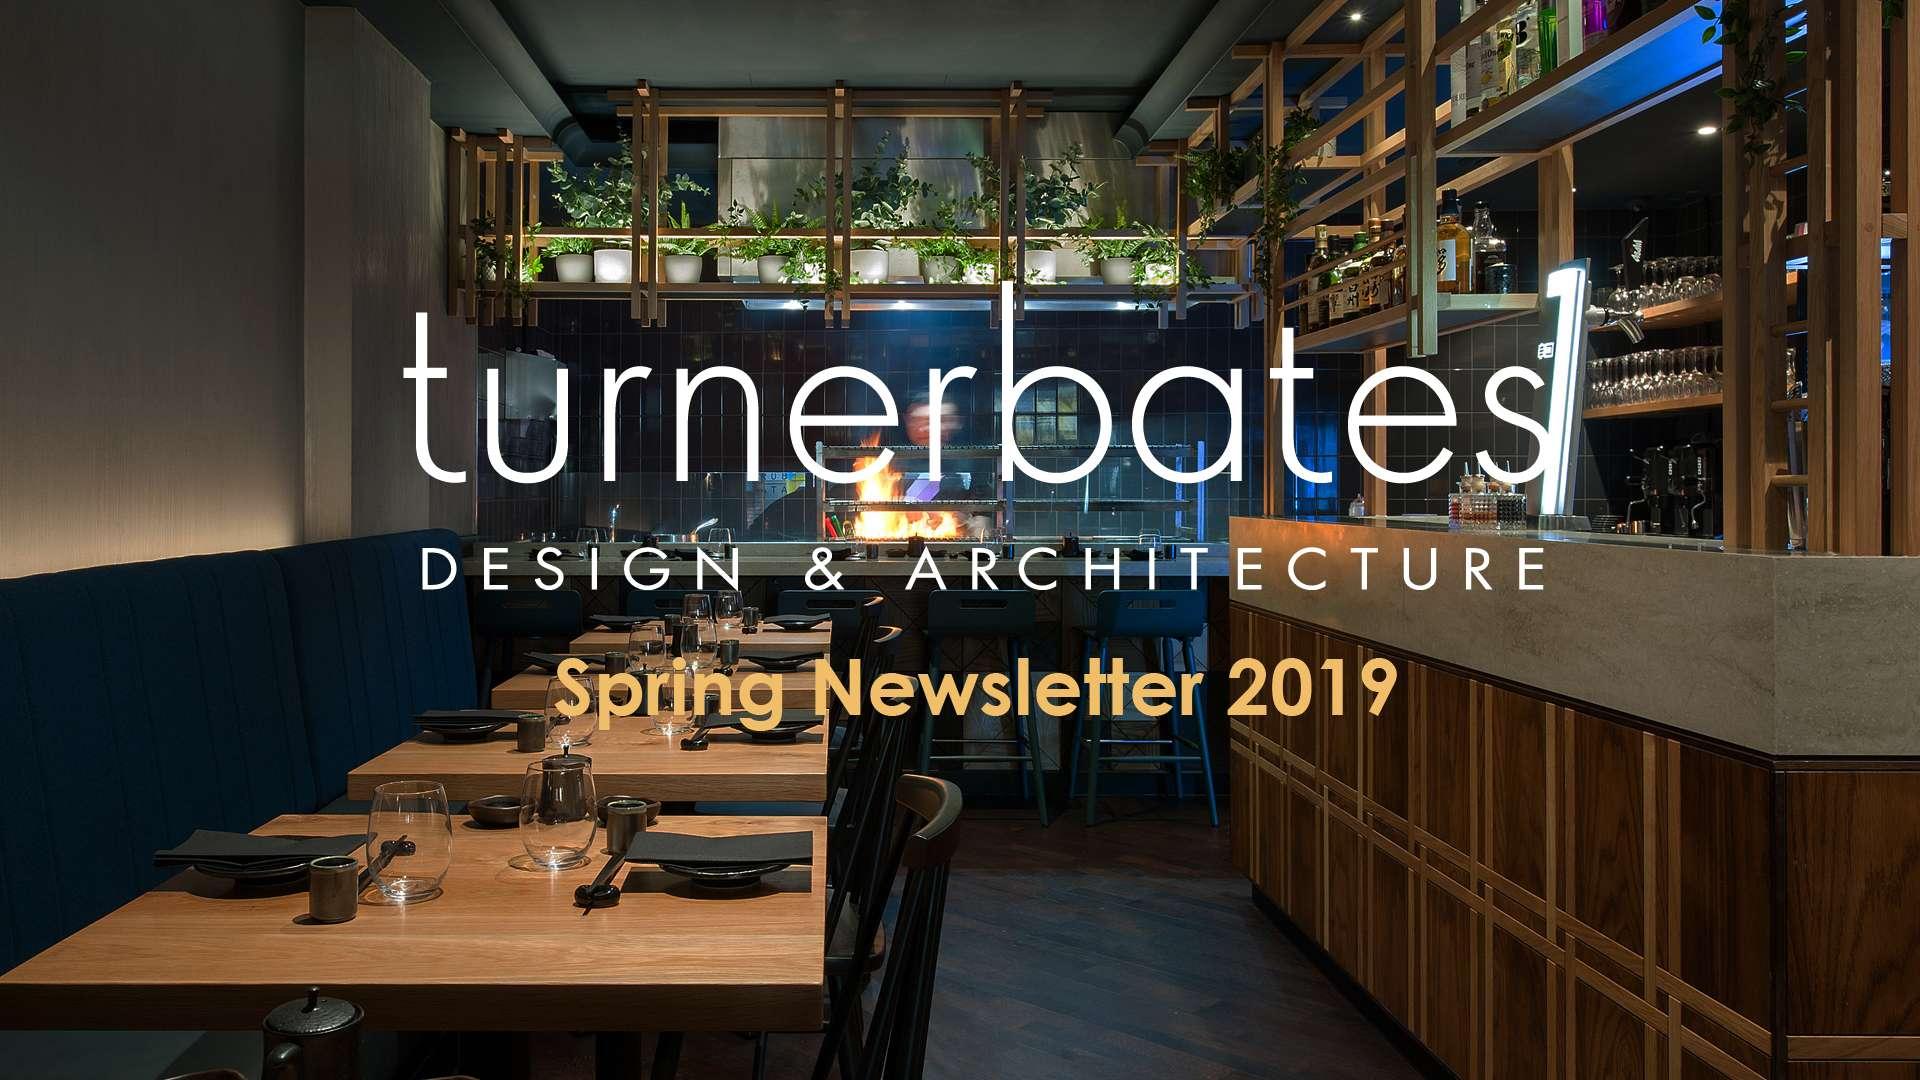 turnerbates Spring Newsletter 2019